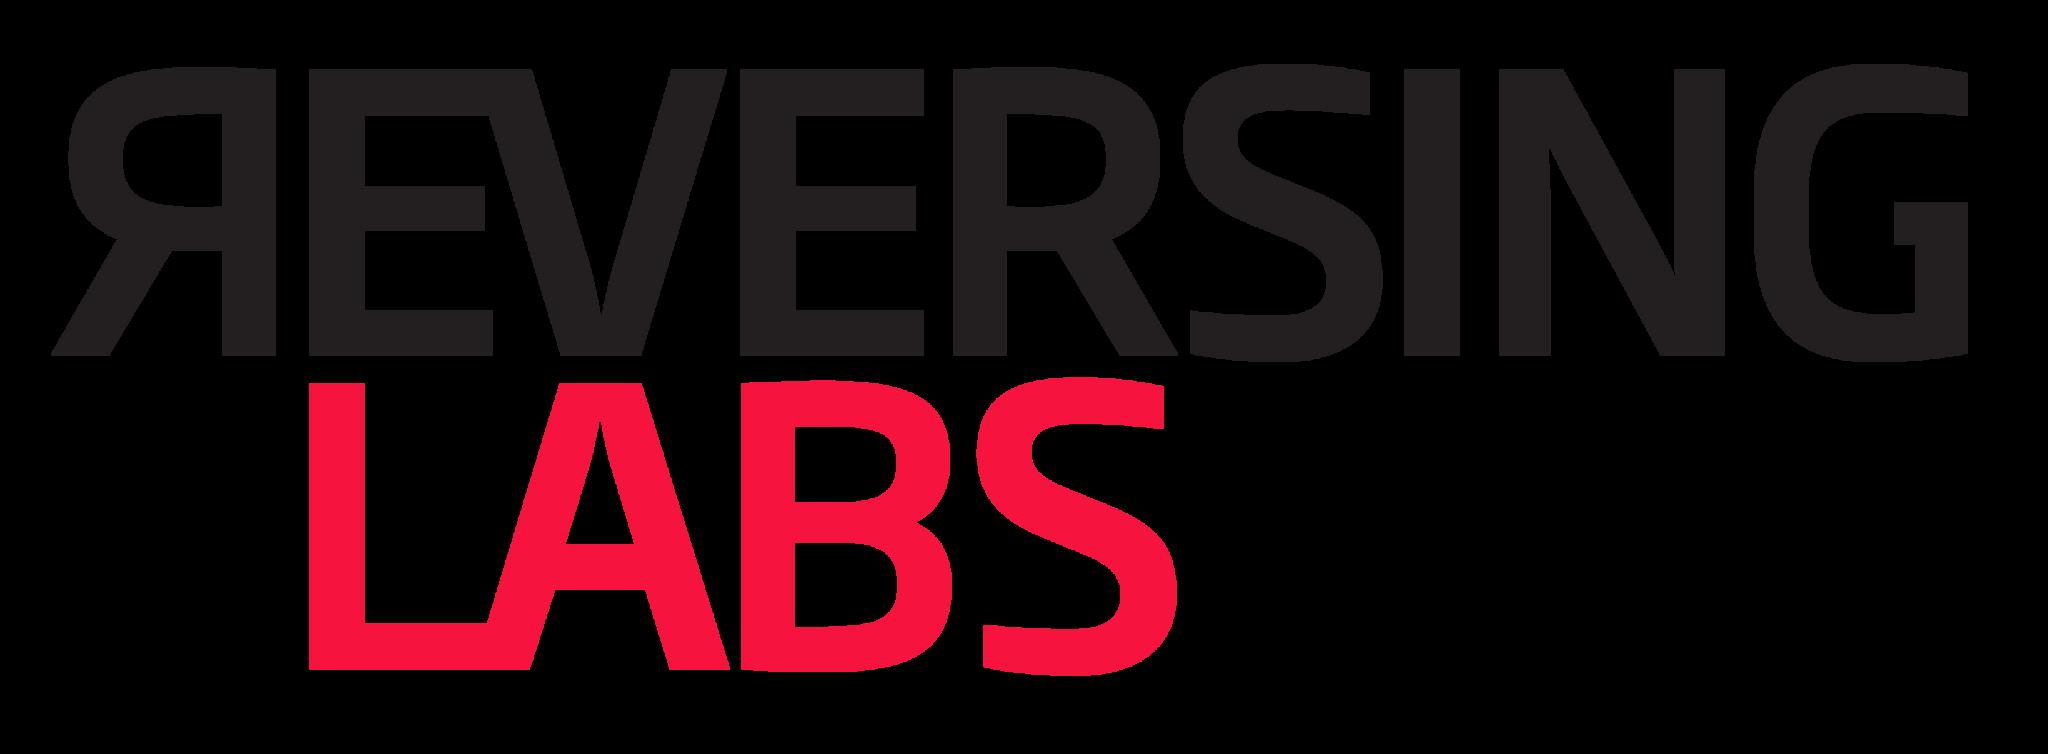 reversing-labs